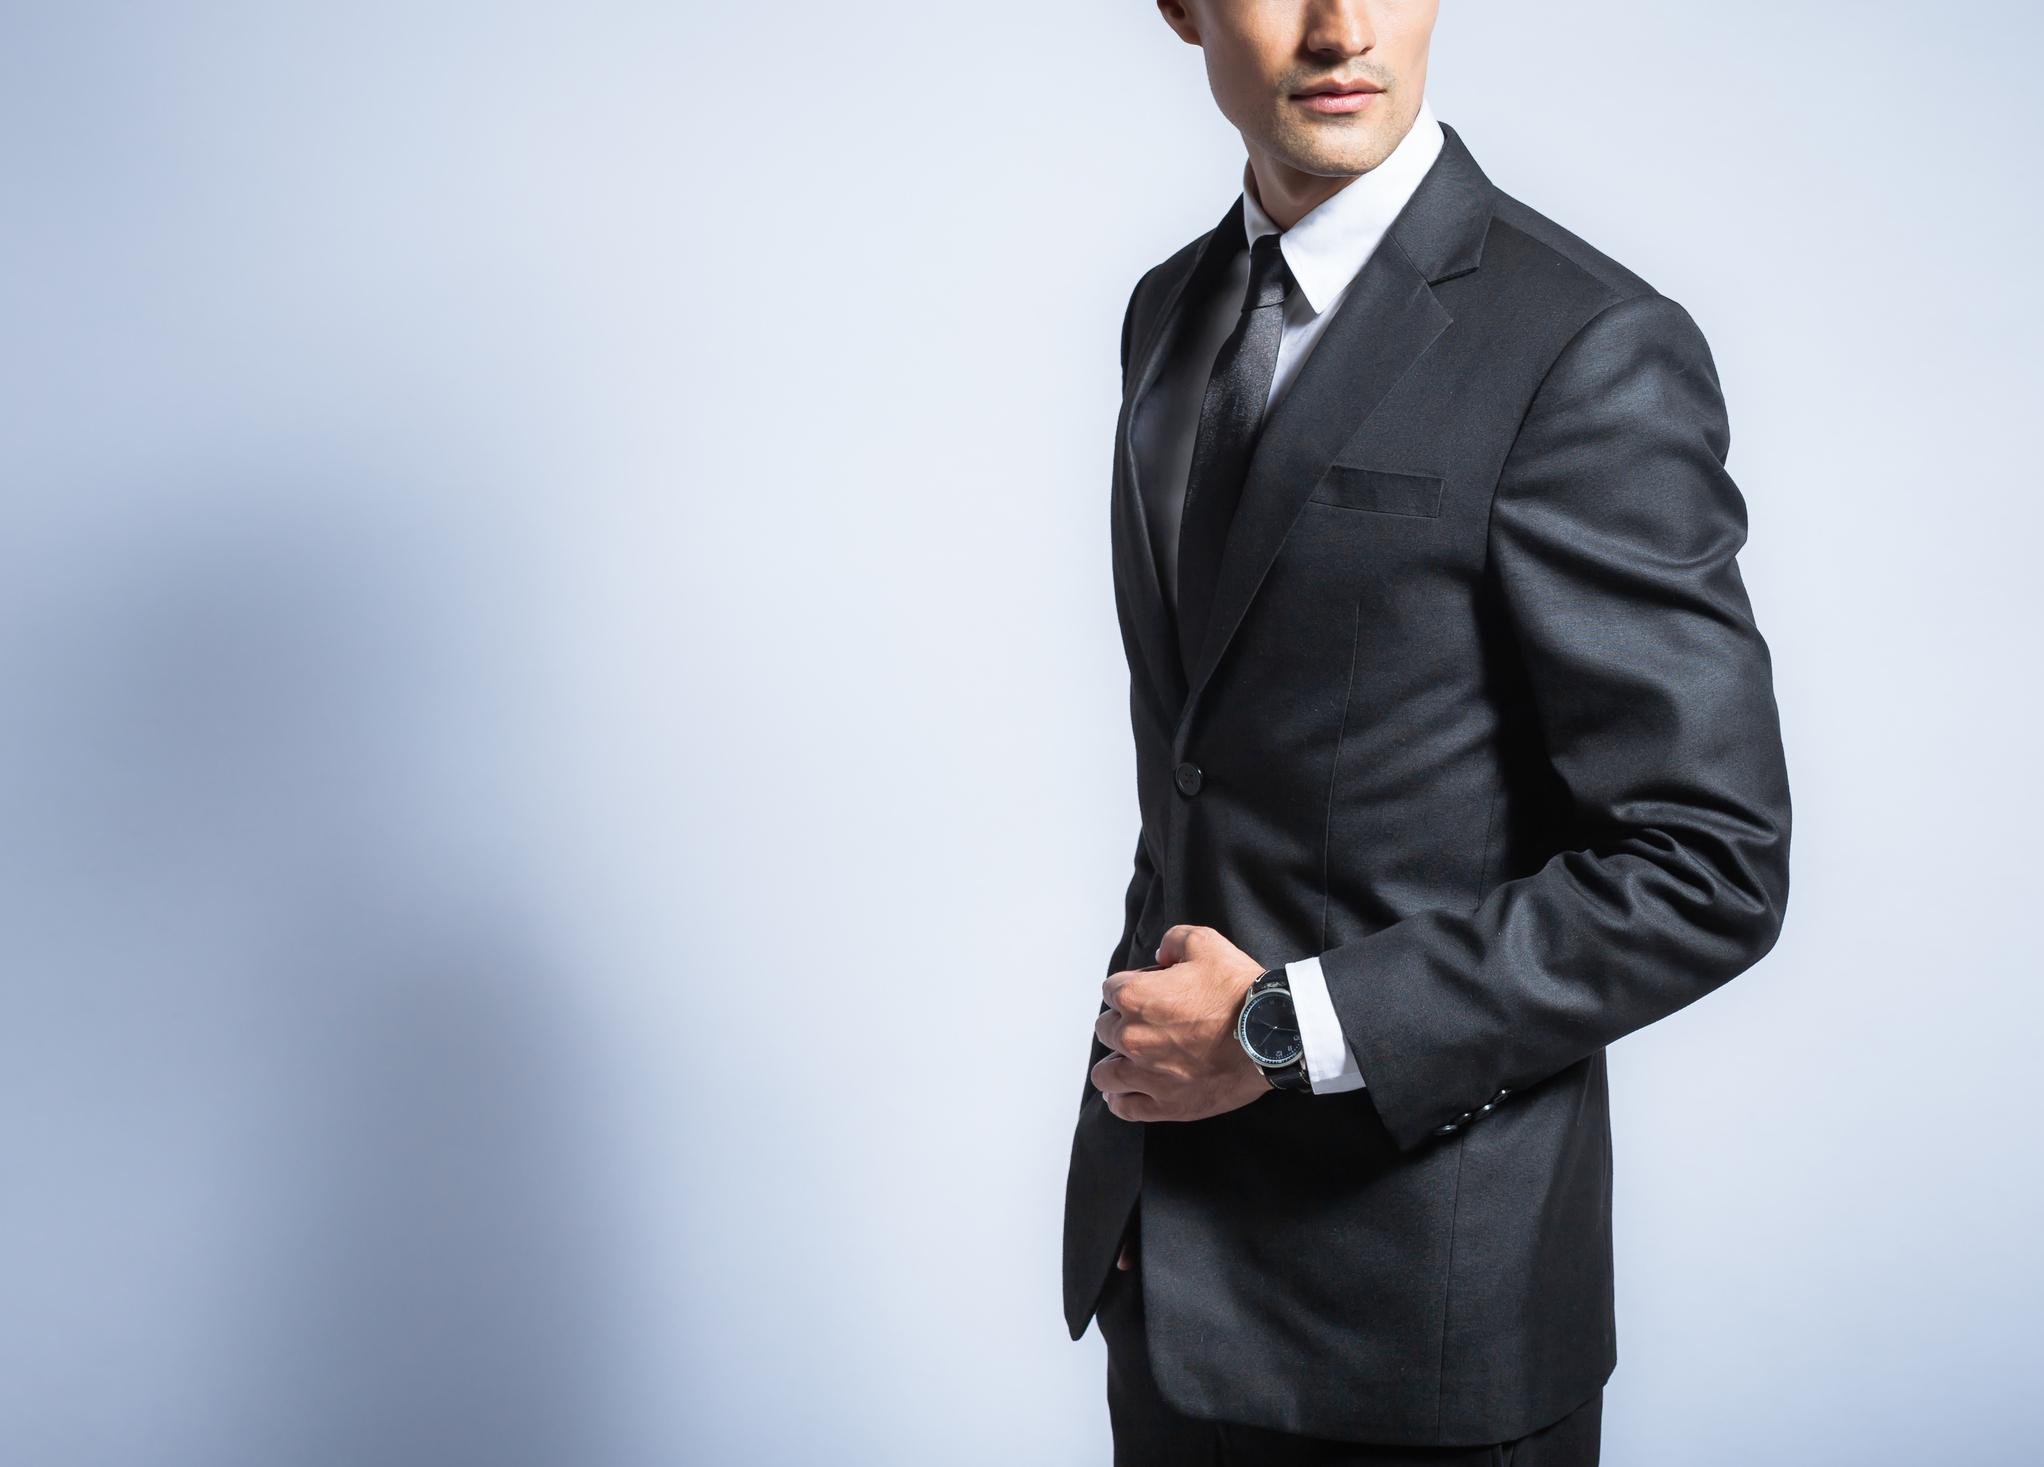 suit getty.